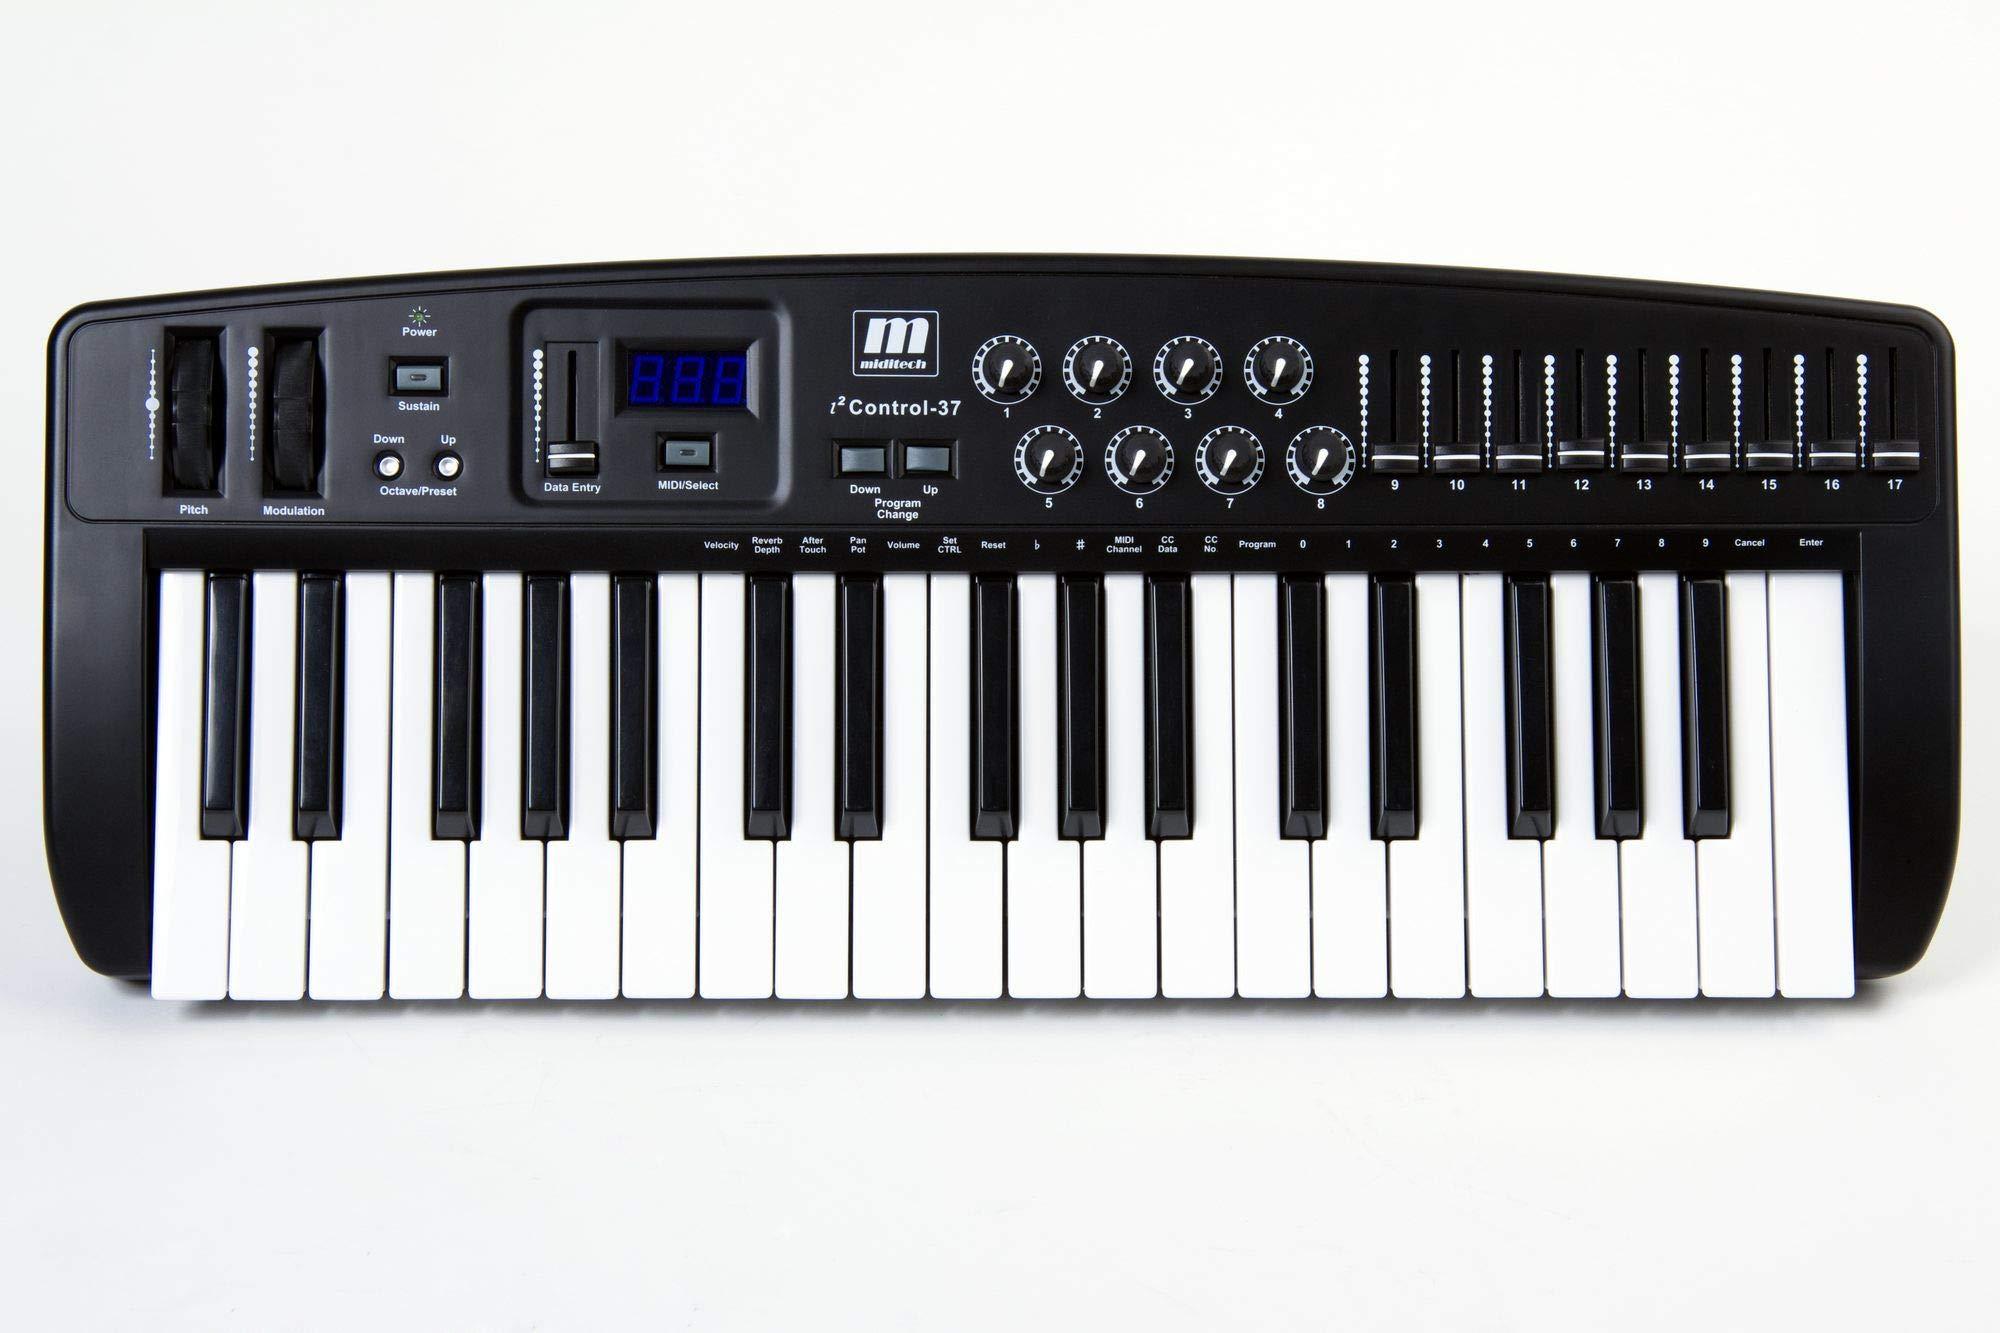 i2 Control 37 USB MIDI Controller Keyboard